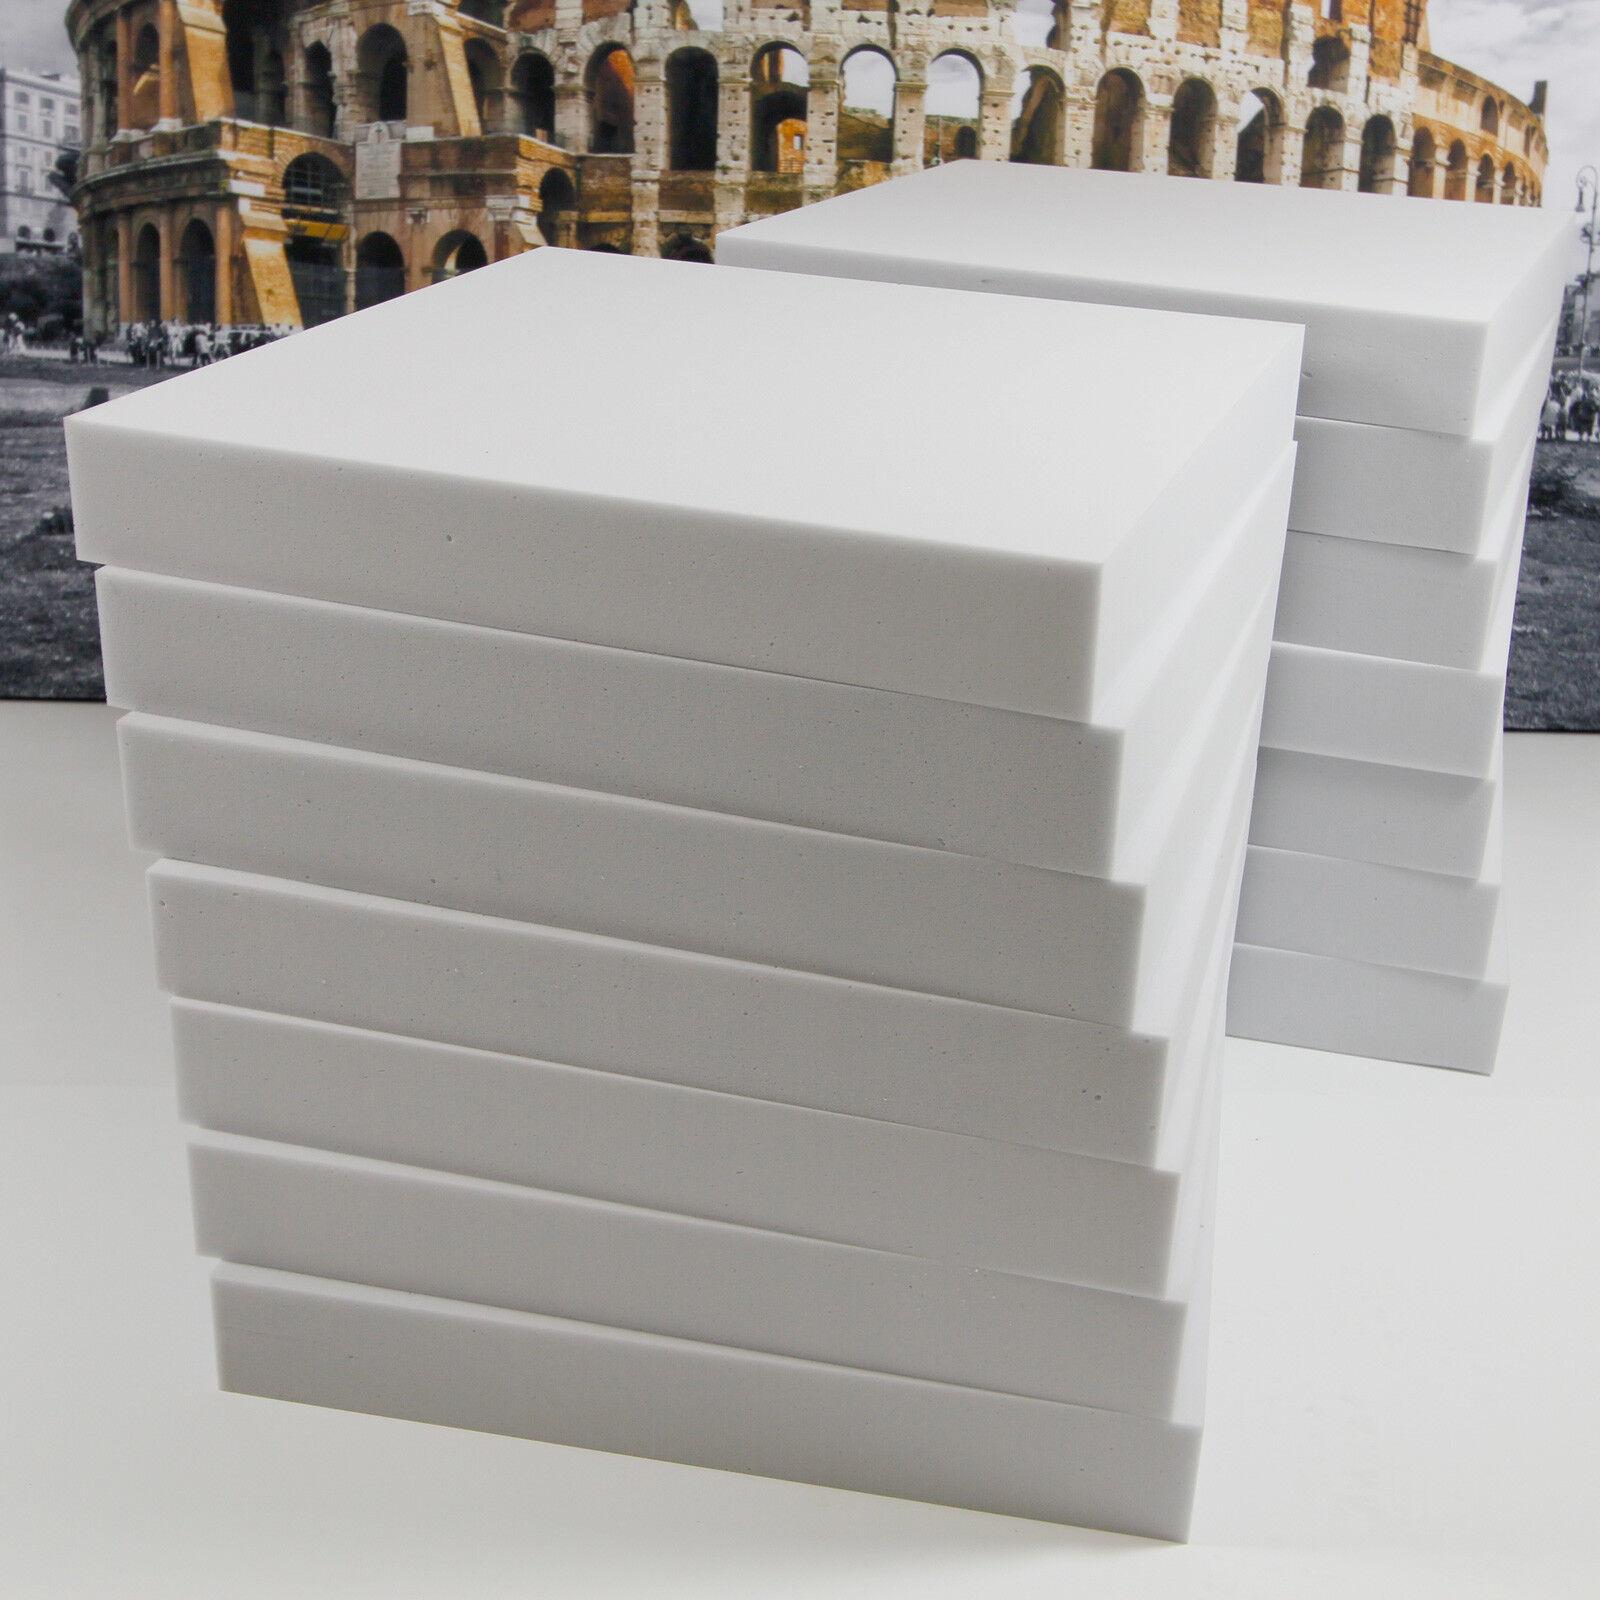 12 Schall Lärm Dämmung Akustik Absorber Platte 50x50x7 aus Basotect® G+ Hellgrau